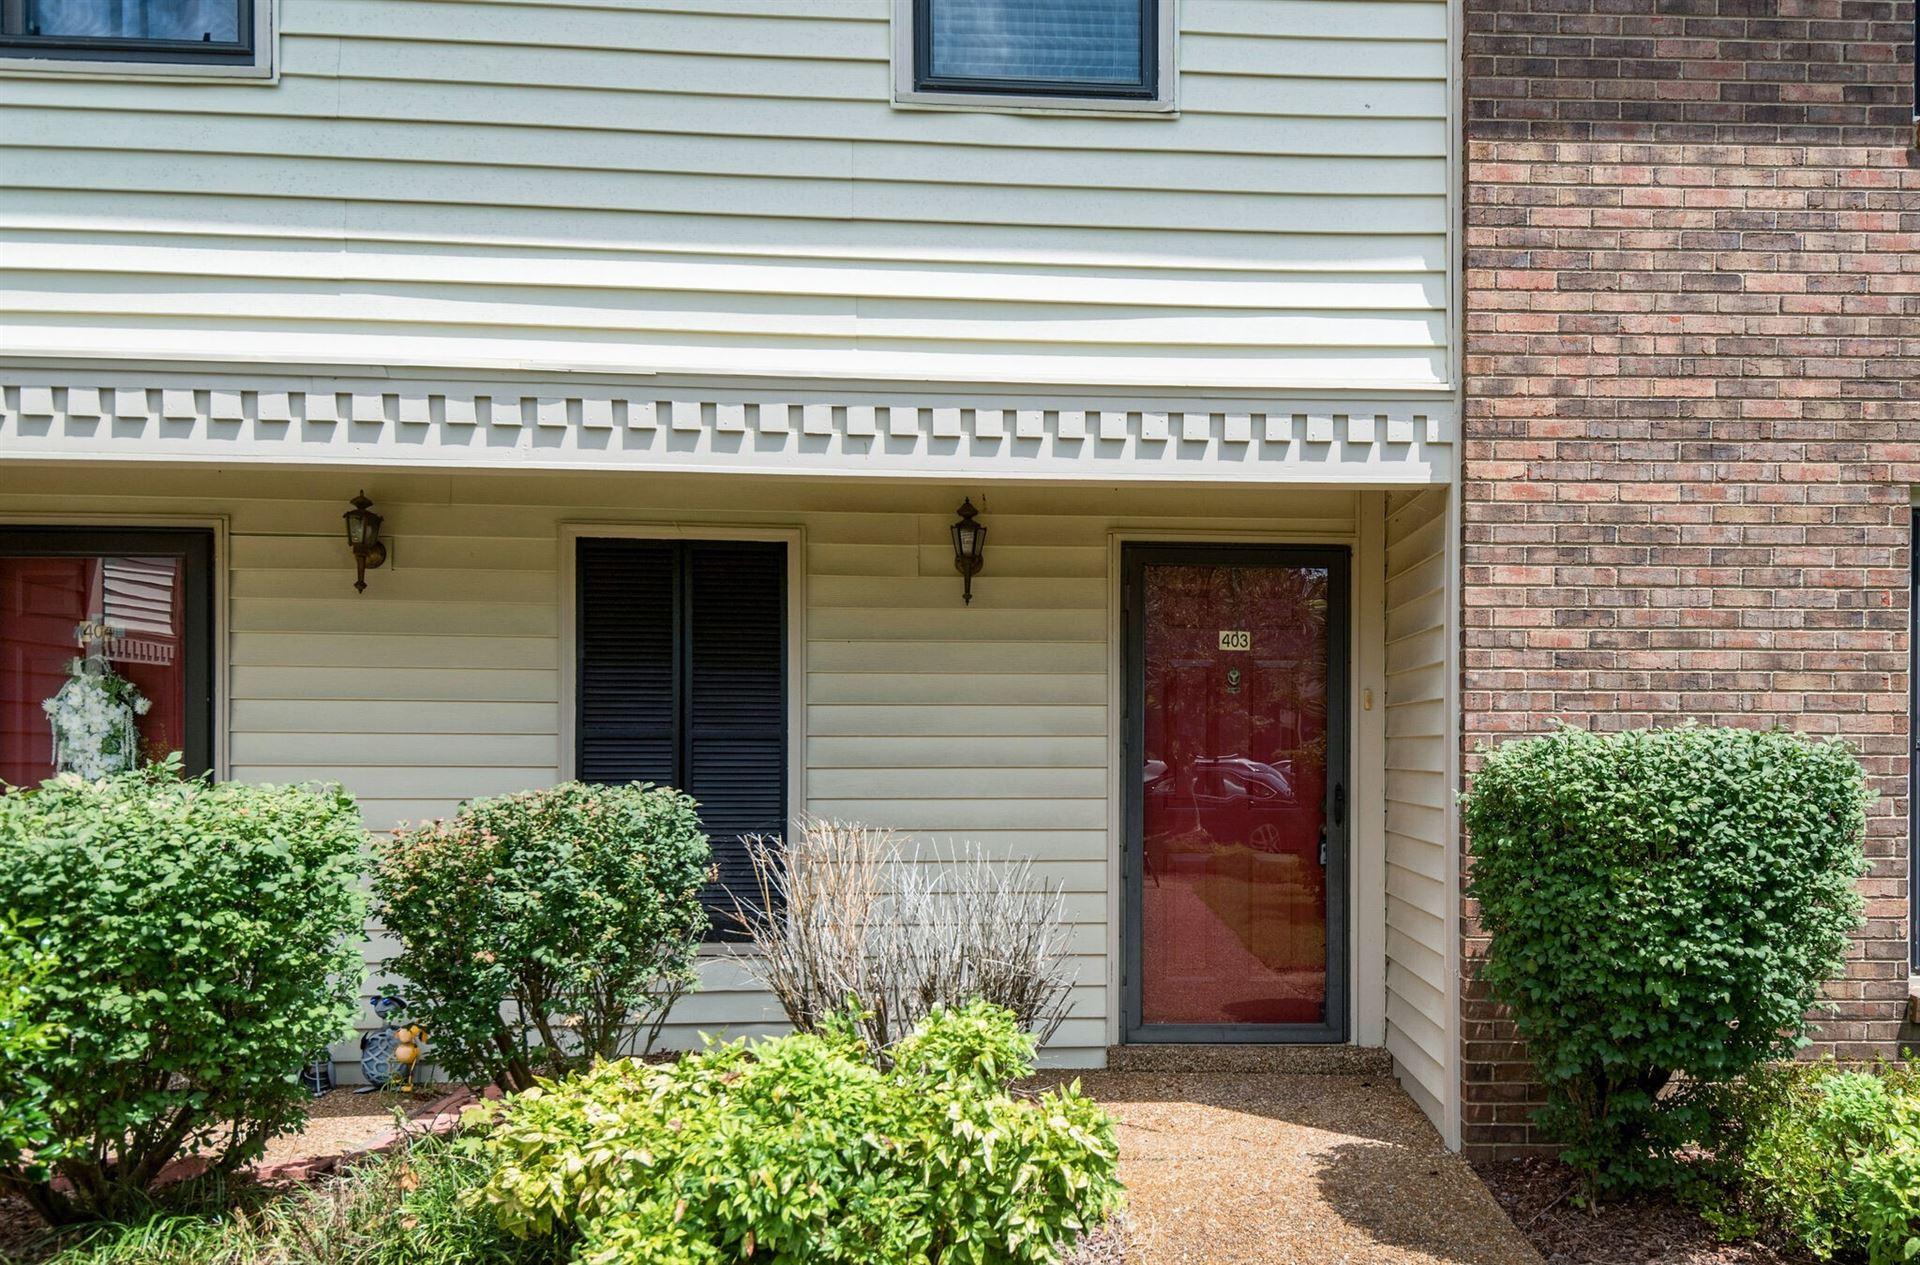 403 Westfield, Nashville, TN 37221 - MLS#: 2205141